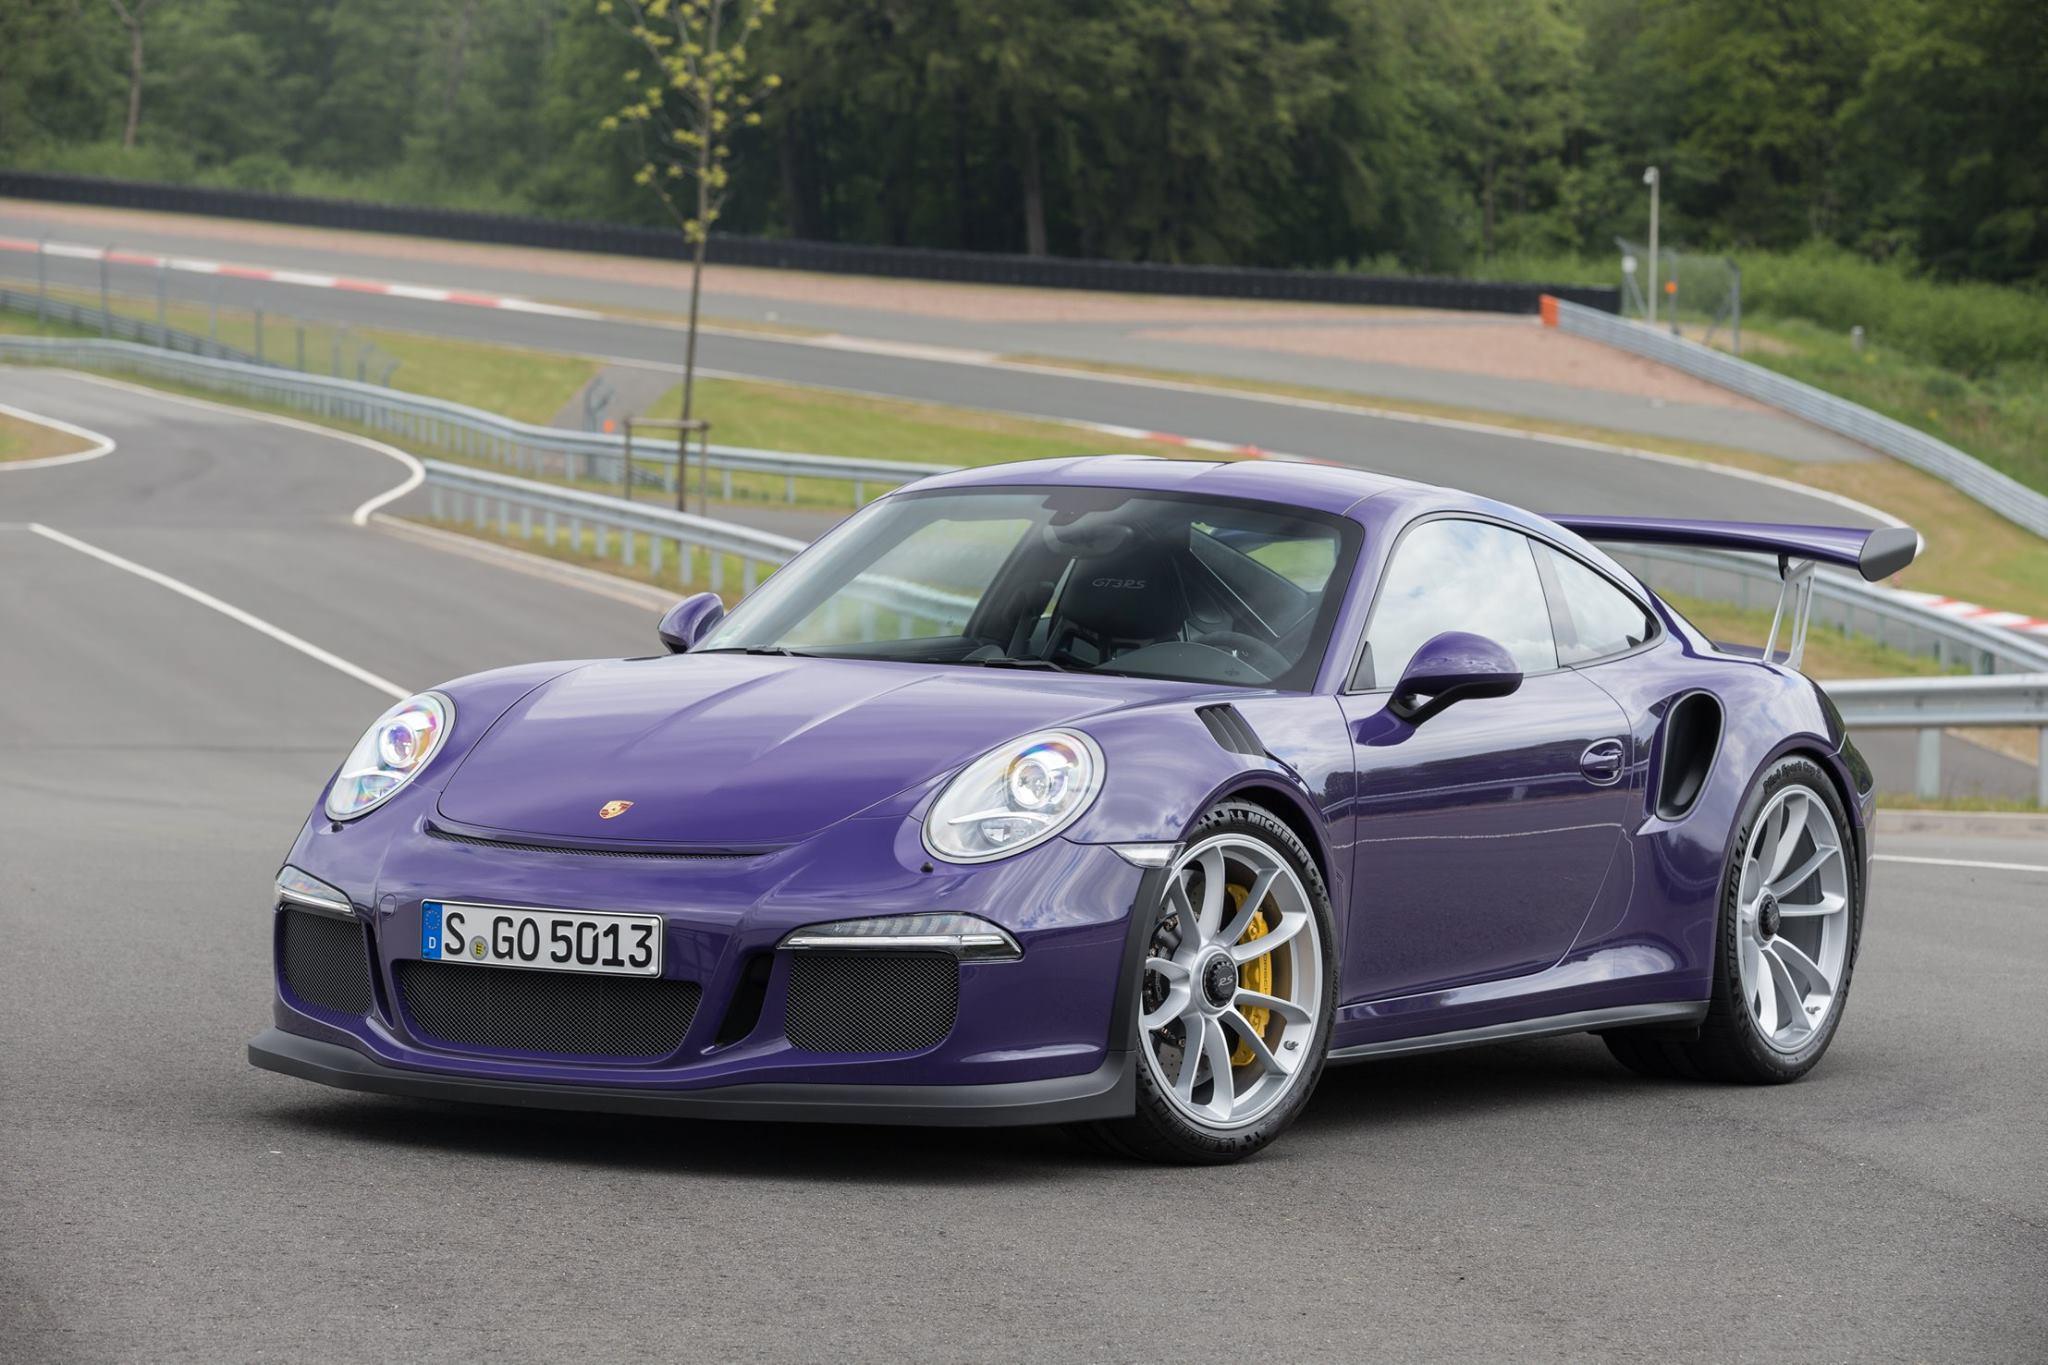 Gorgeous Ultraviolet Porsche 911 GT3 RS! , GTspirit